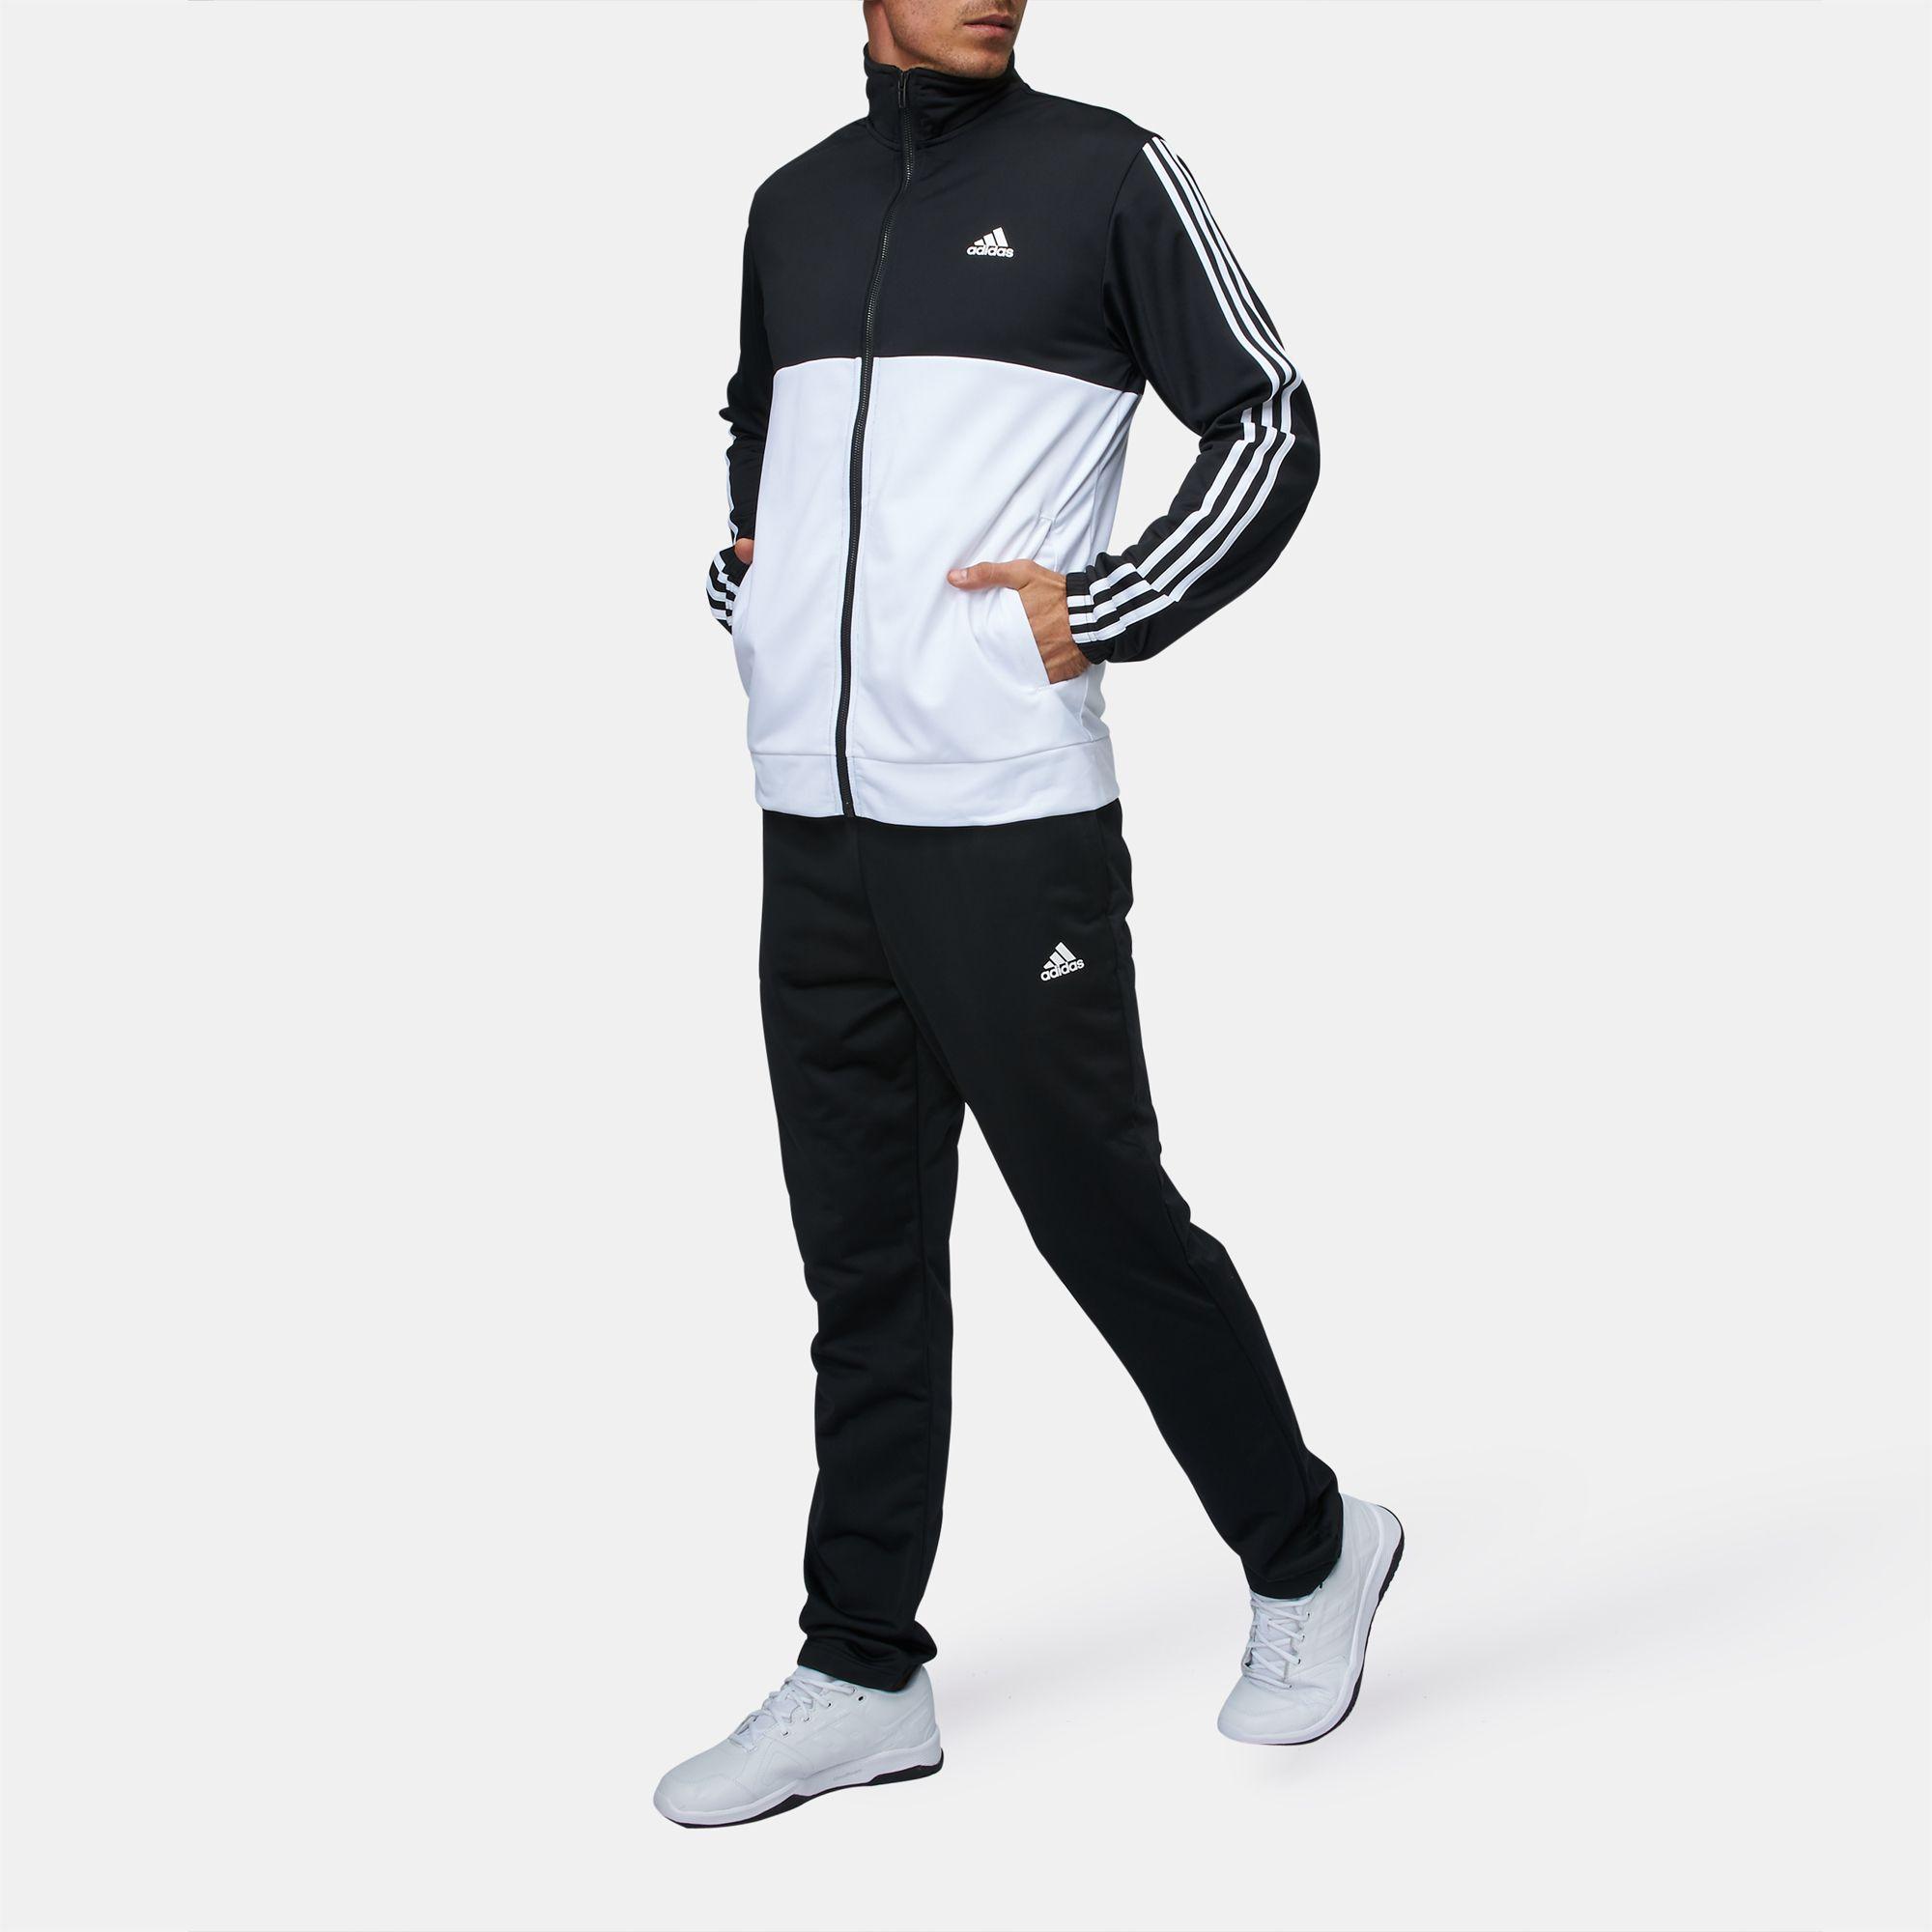 4ac0057a3479 adidas Back 2 Basics 3-Stripes Track Suit